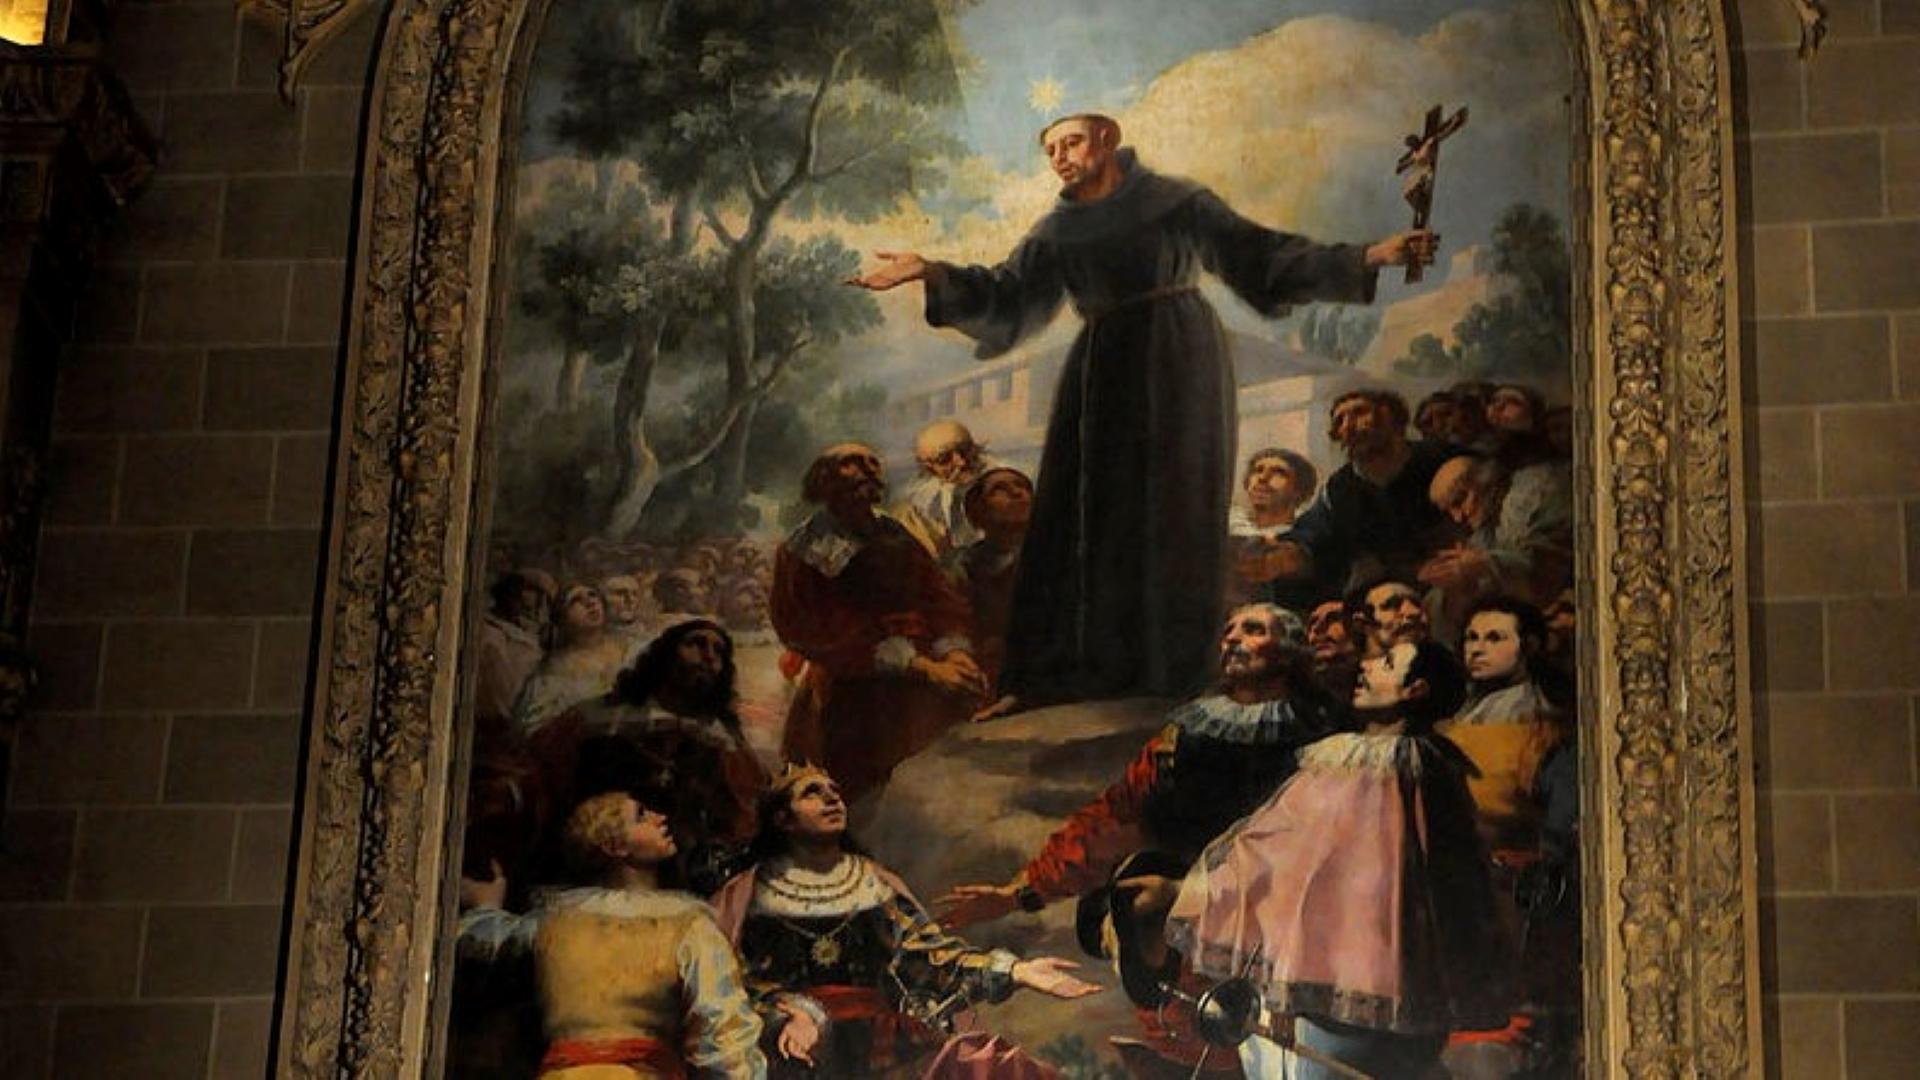 heilige-Bernardus-van-Siena-olvternood